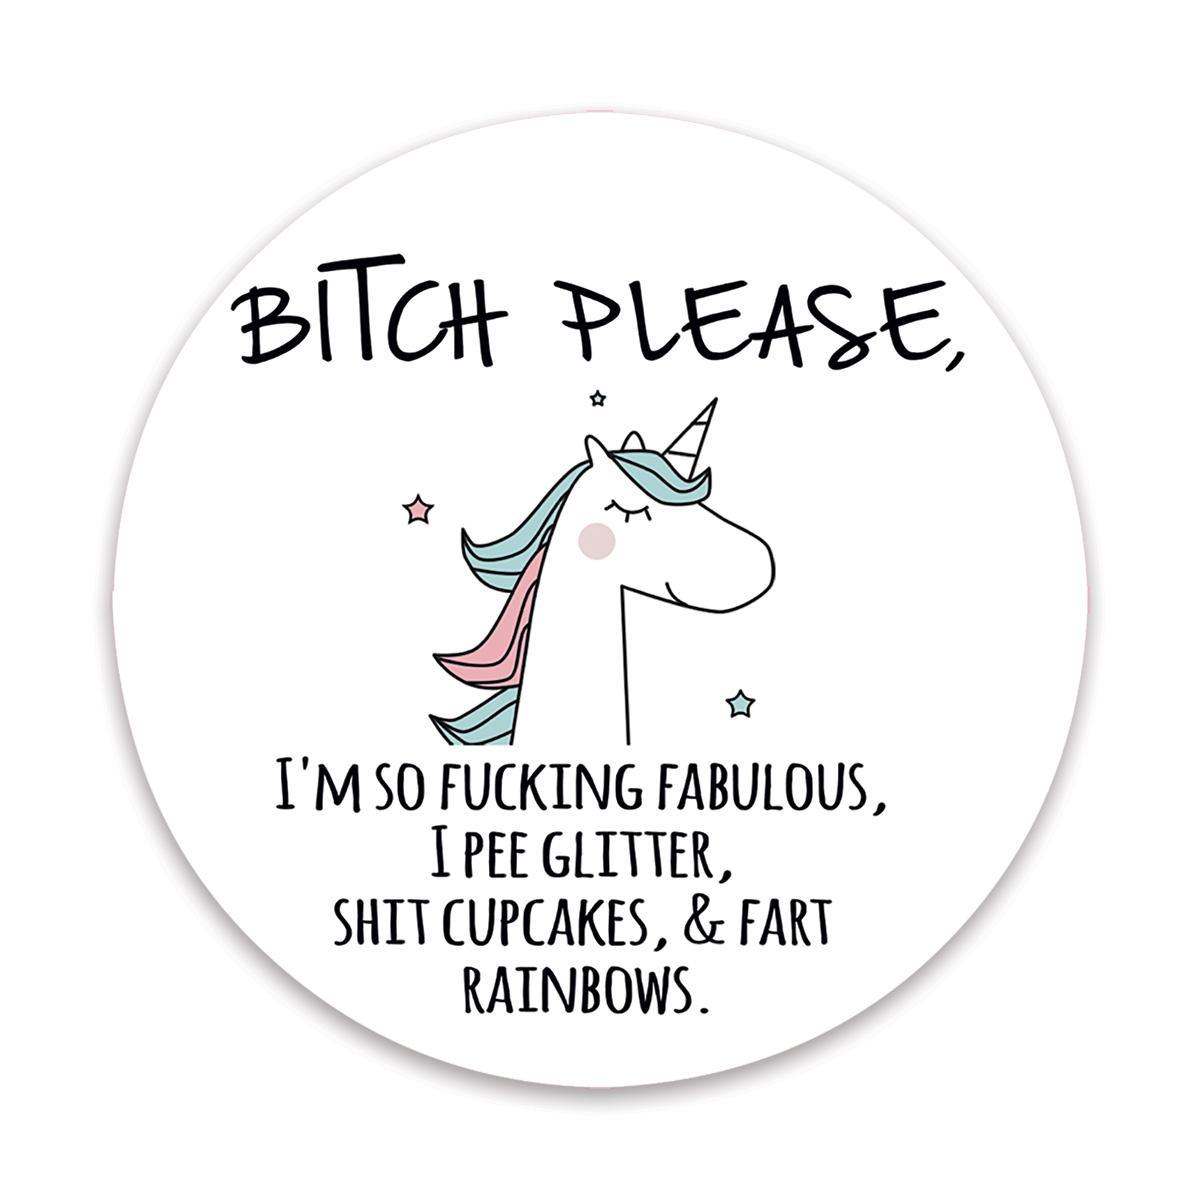 BITCH Please Unicorn : Gift Sticker Fart Rainbow Glitter Humor Office Funny Fabulous